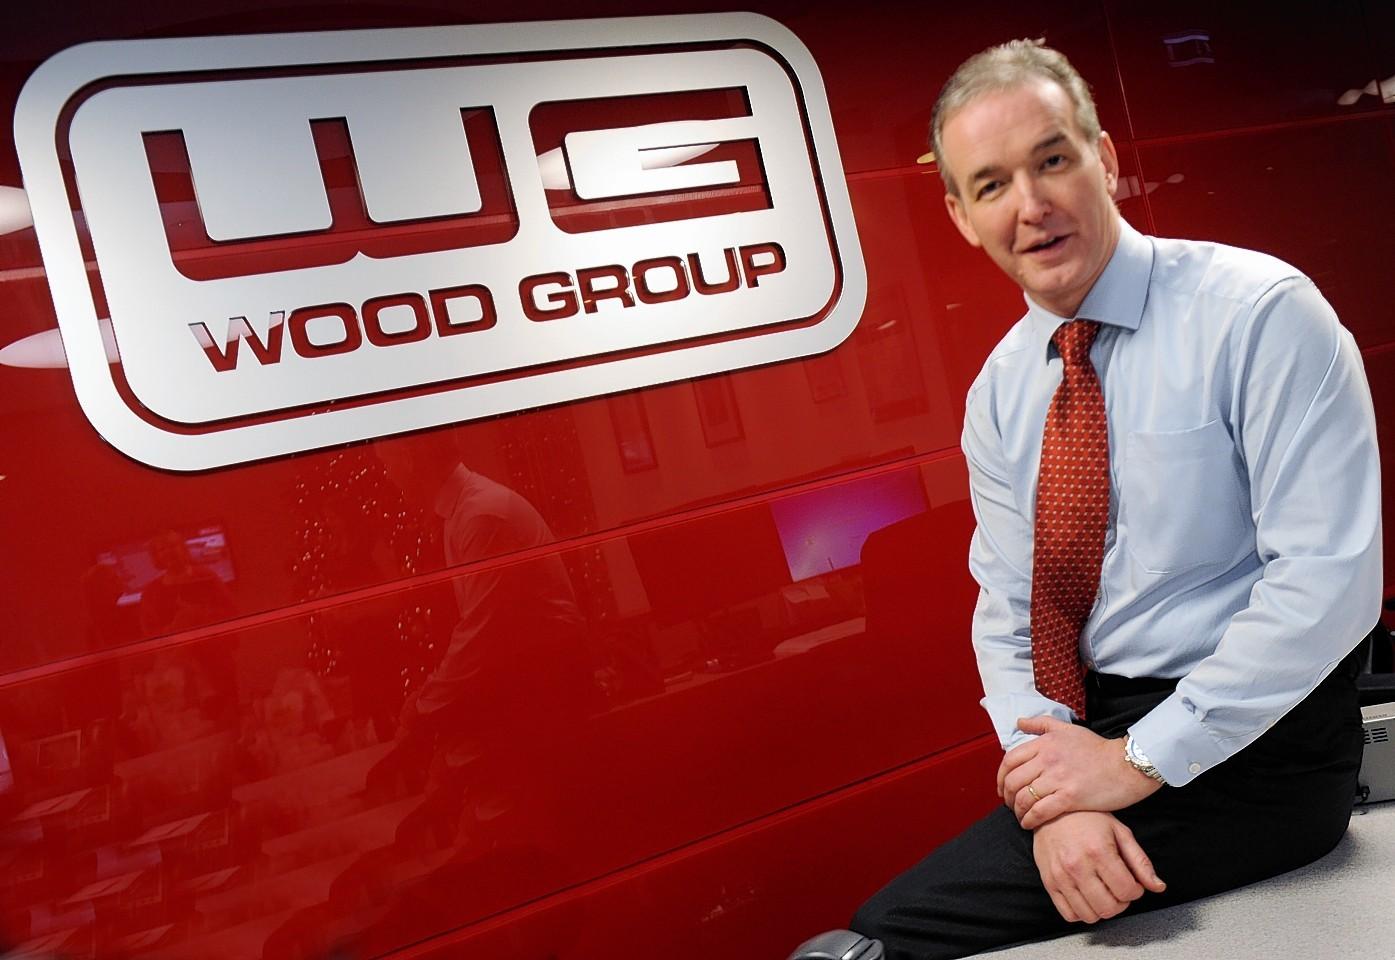 Wood Group PSN Chief Executive Robin Watson